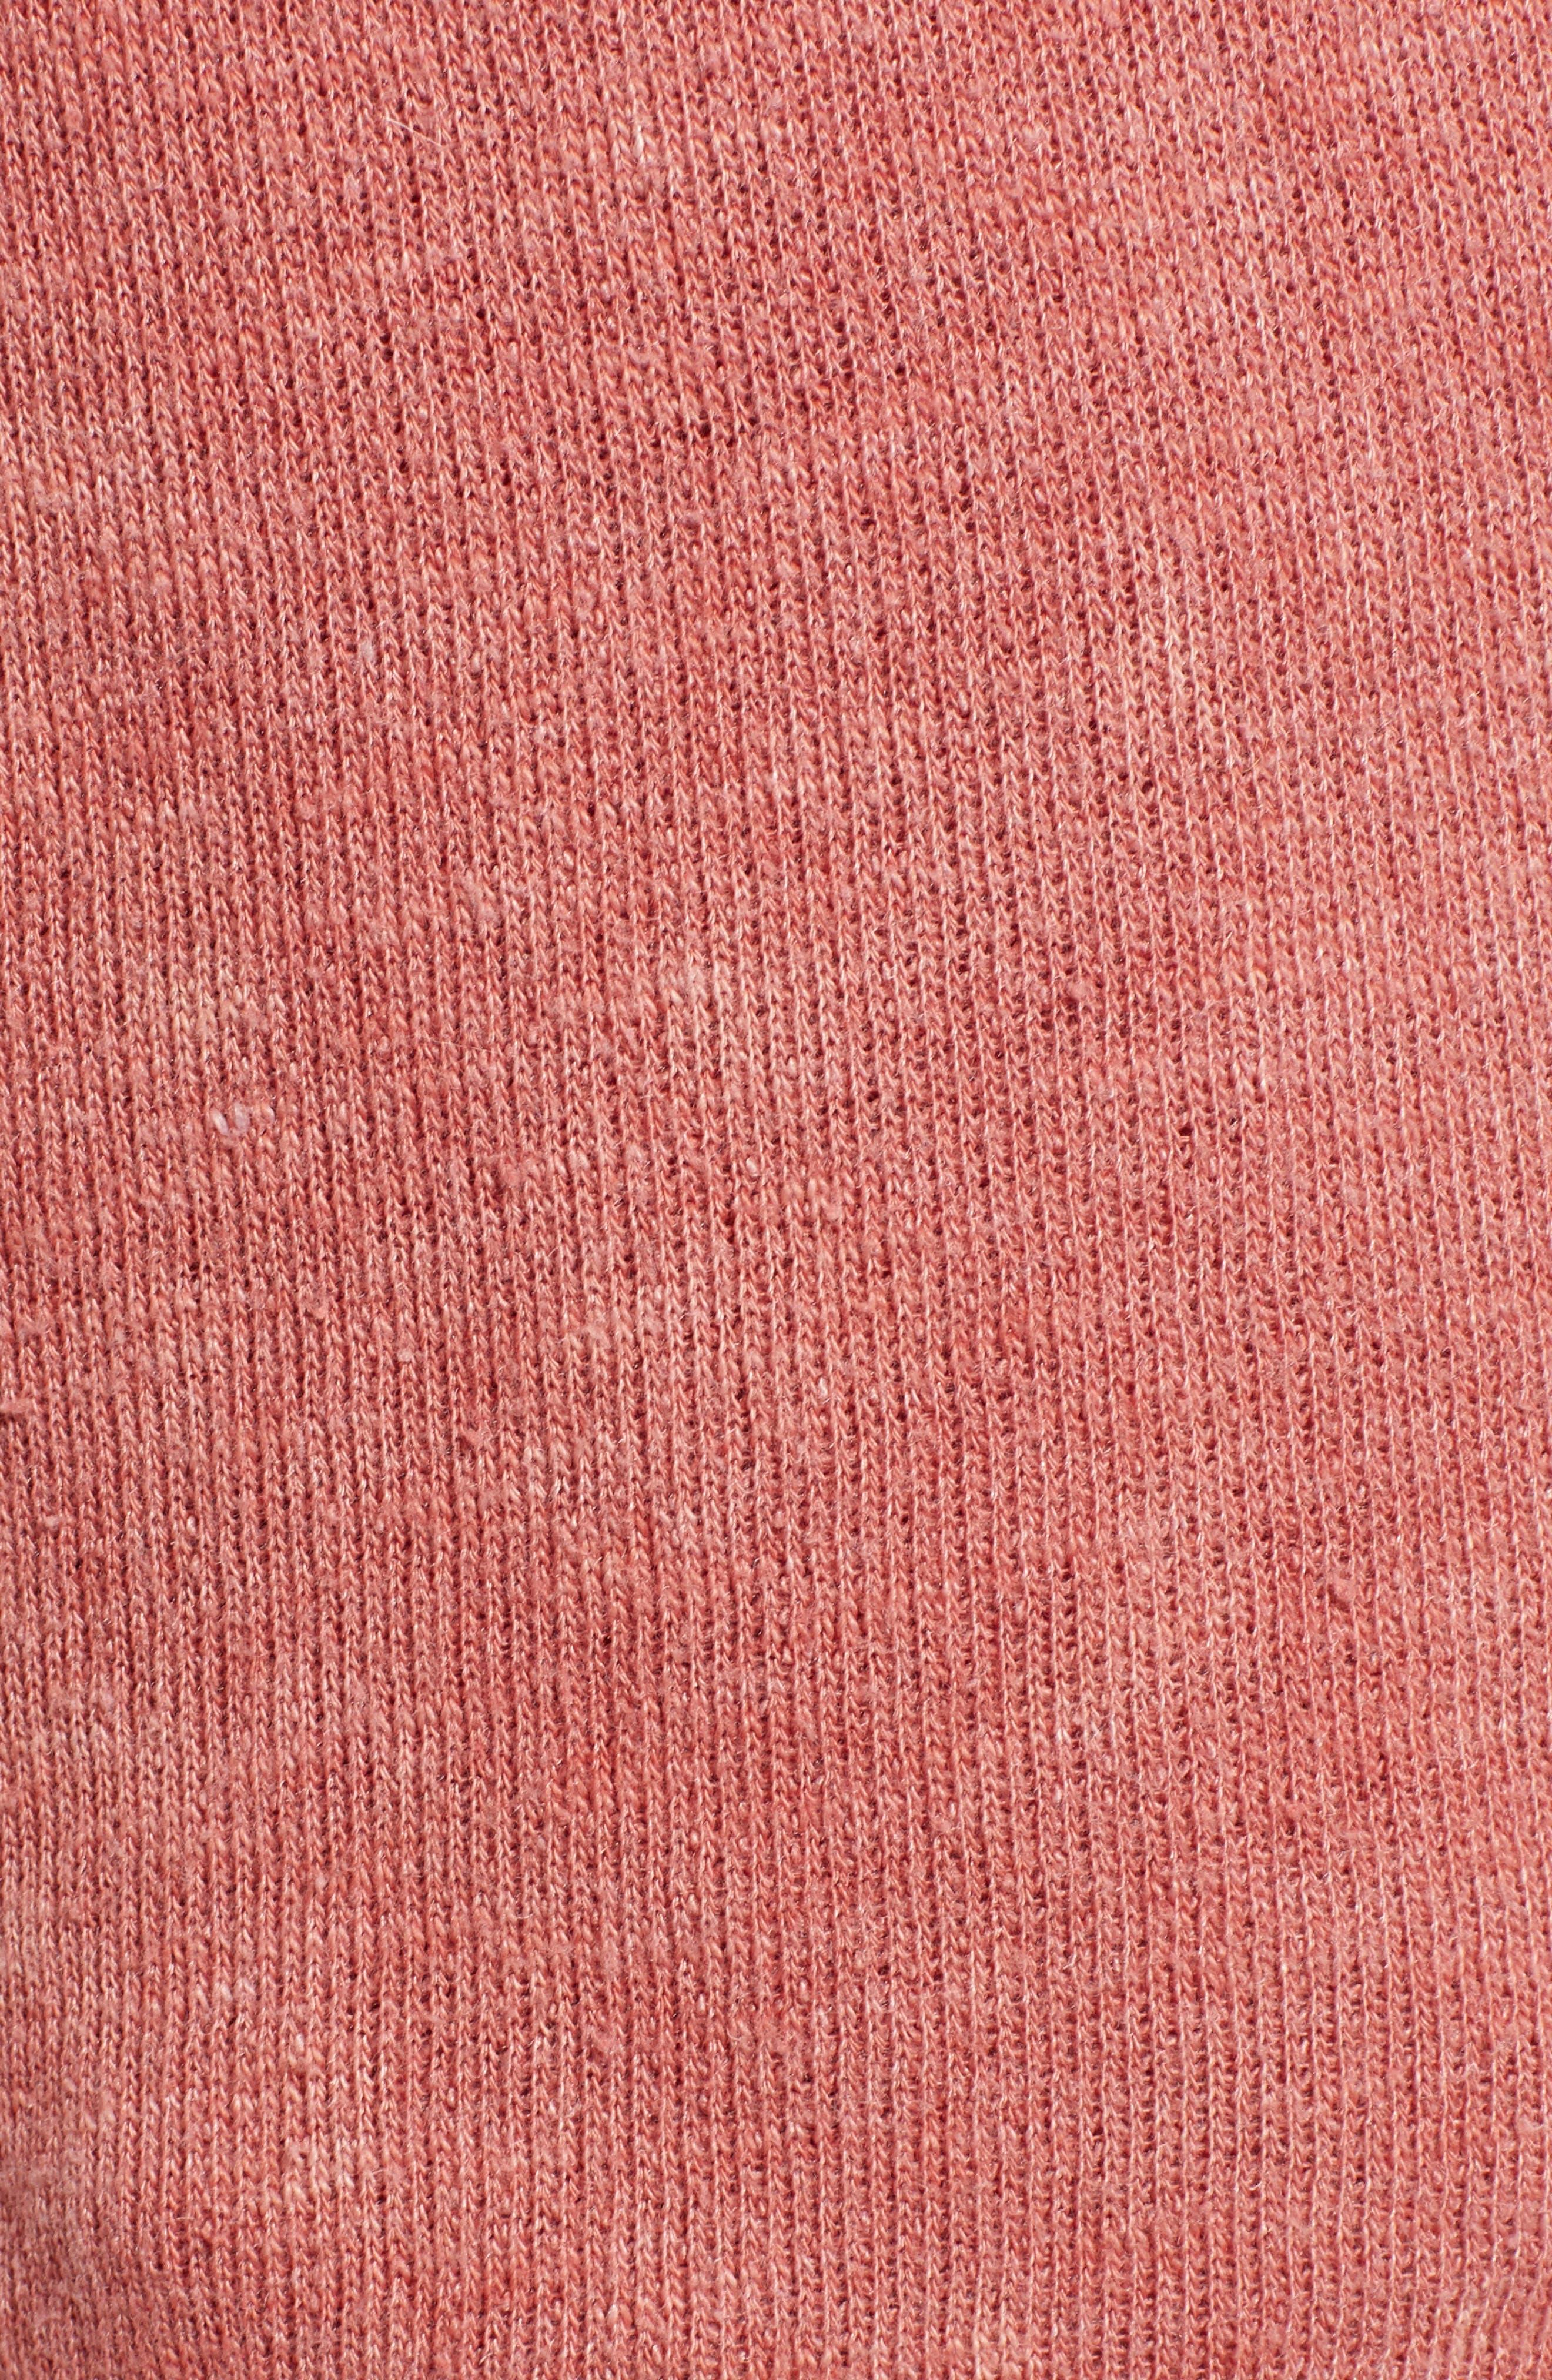 Kiama Shorts,                             Alternate thumbnail 5, color,                             Strawberry Rouge